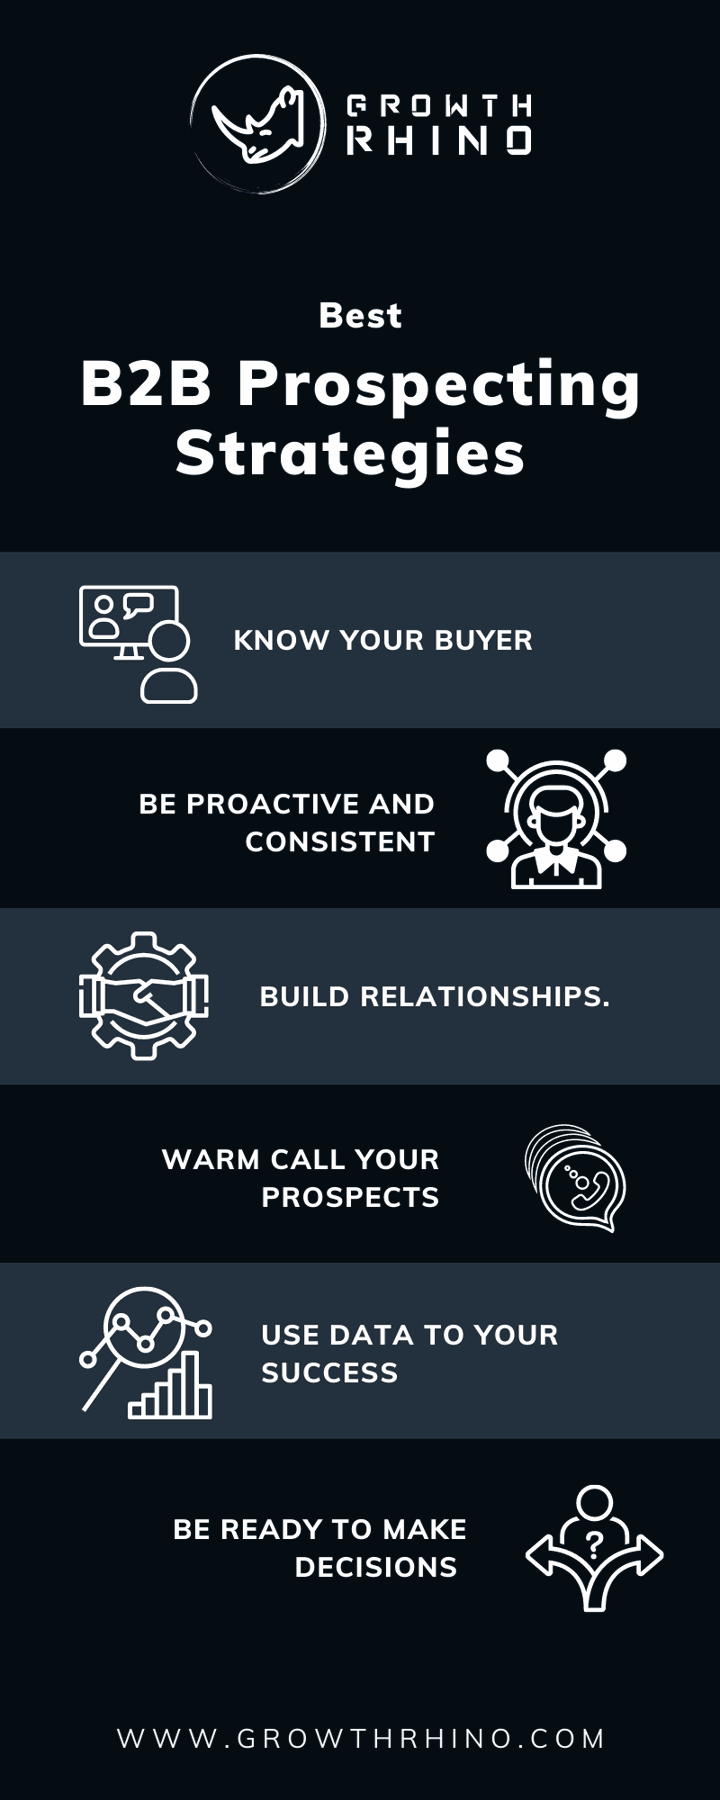 Best B2B Prospecting Strategies